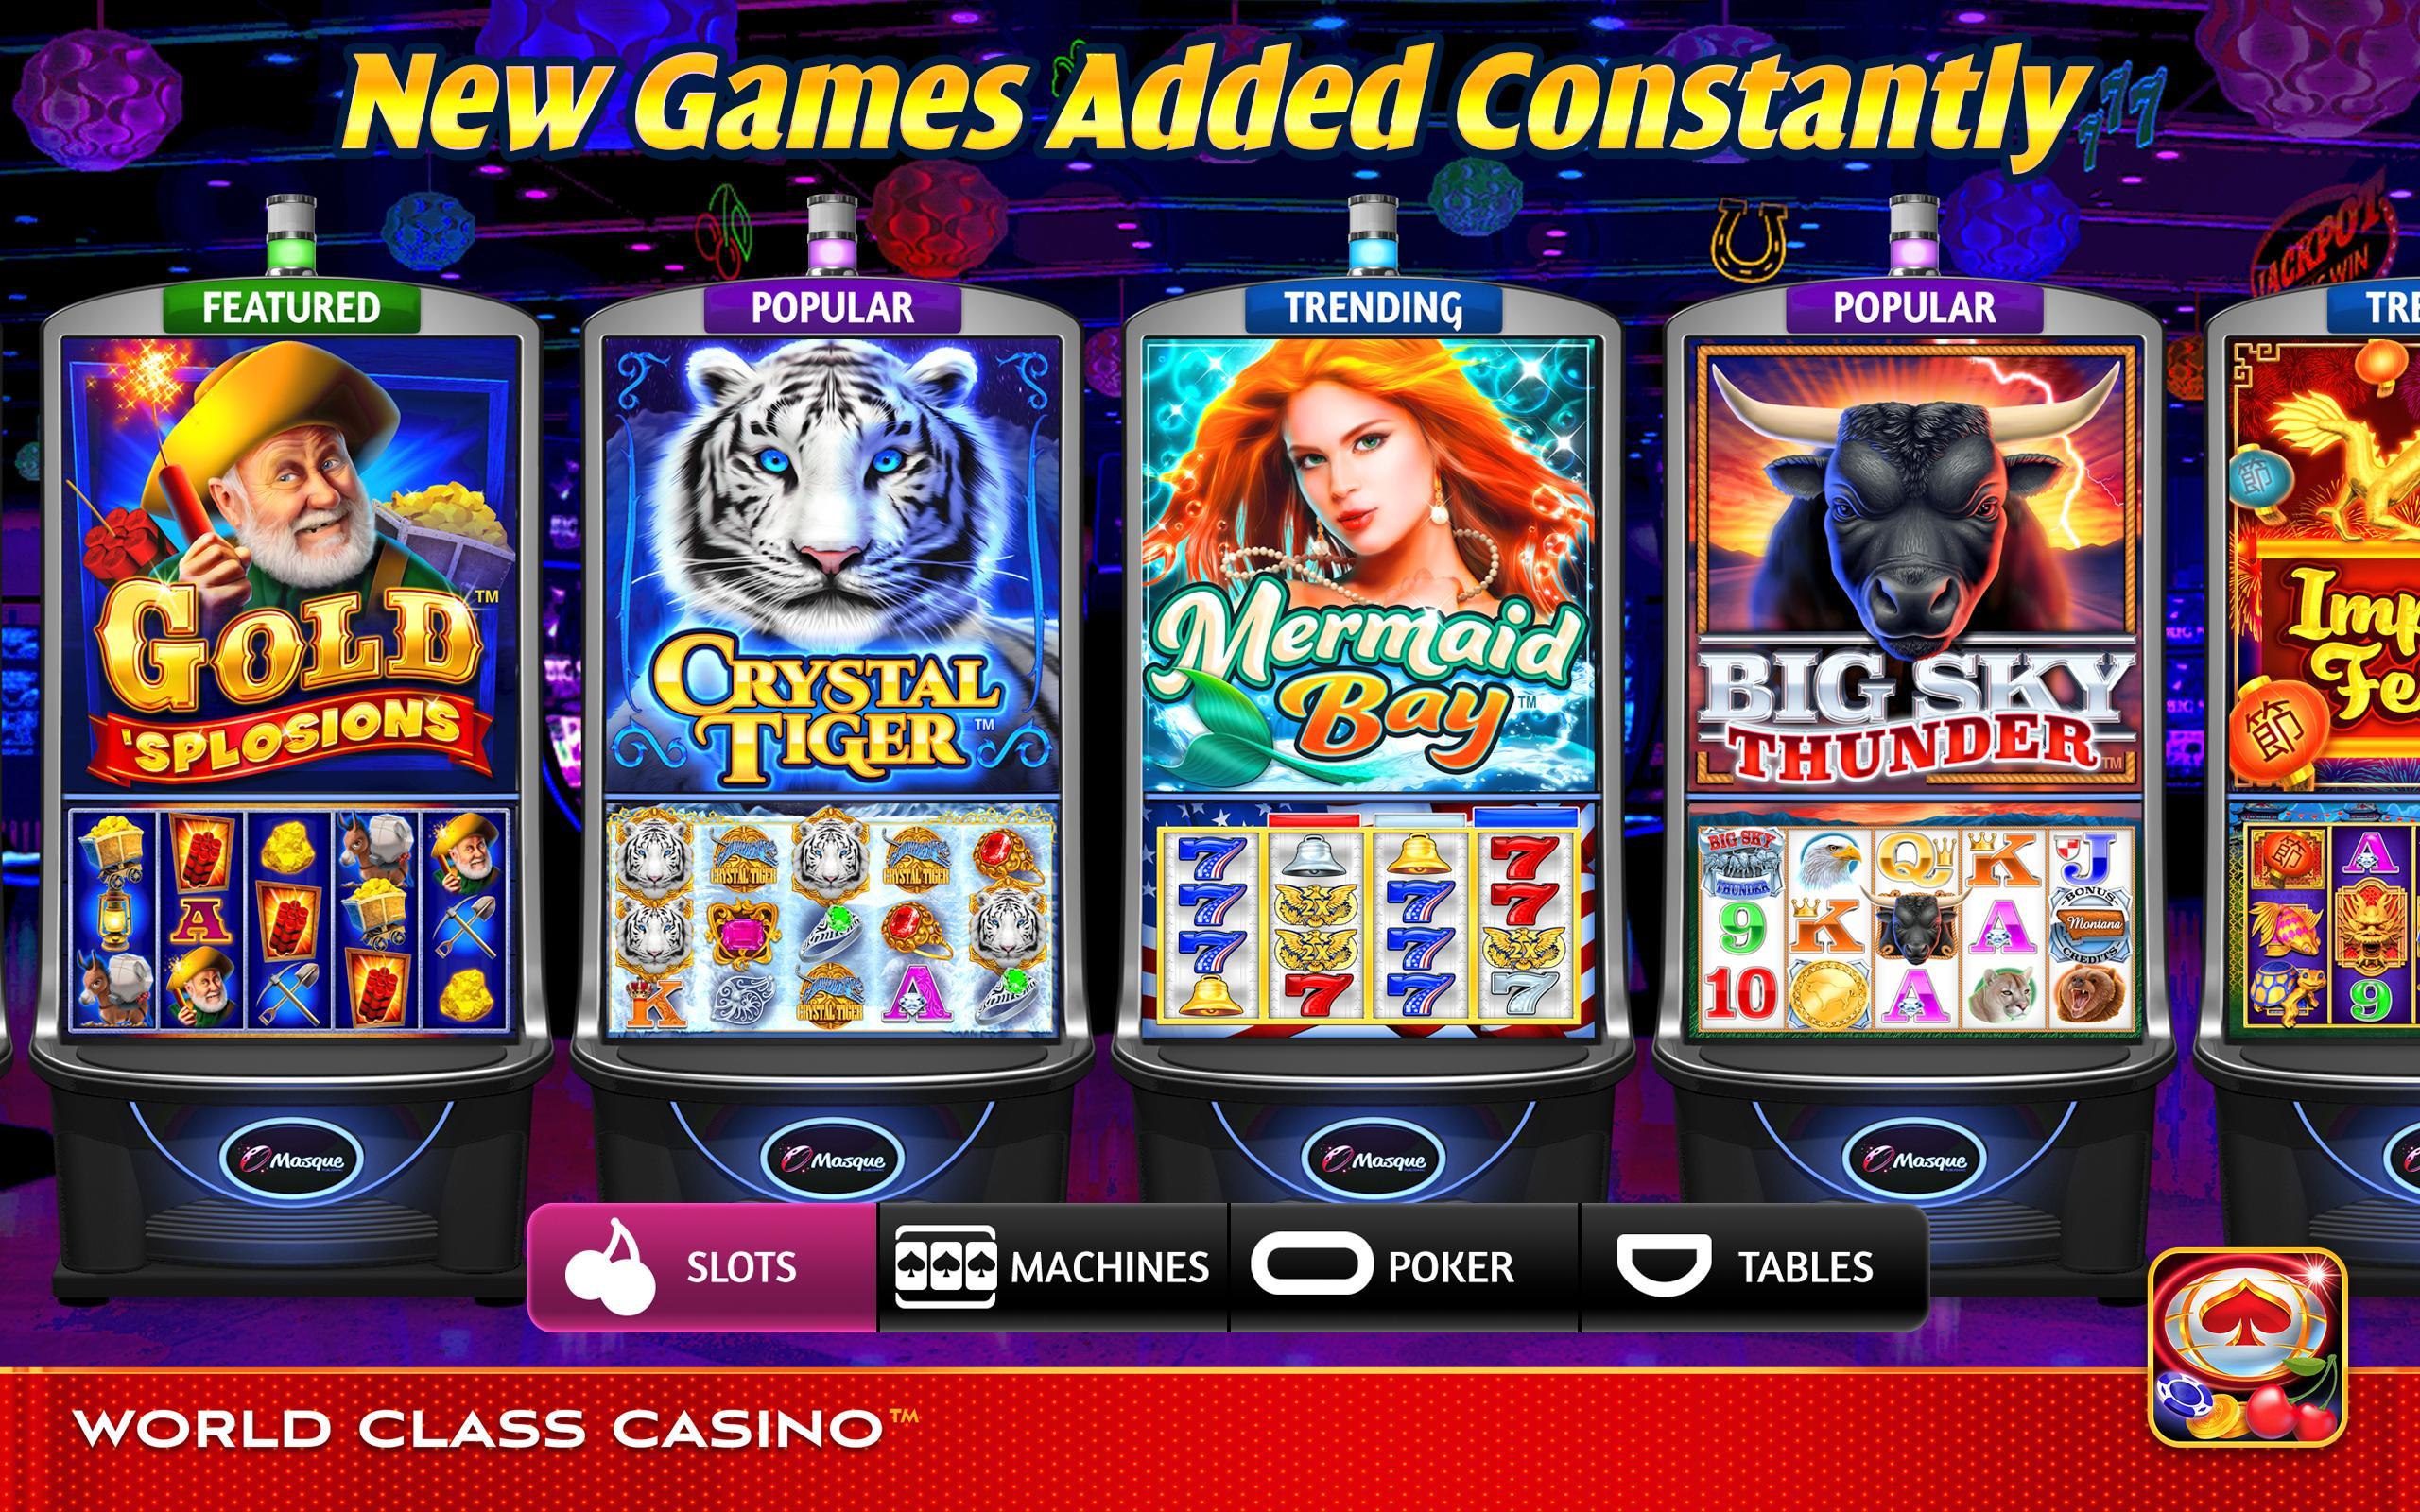 Always vegas casino mobile